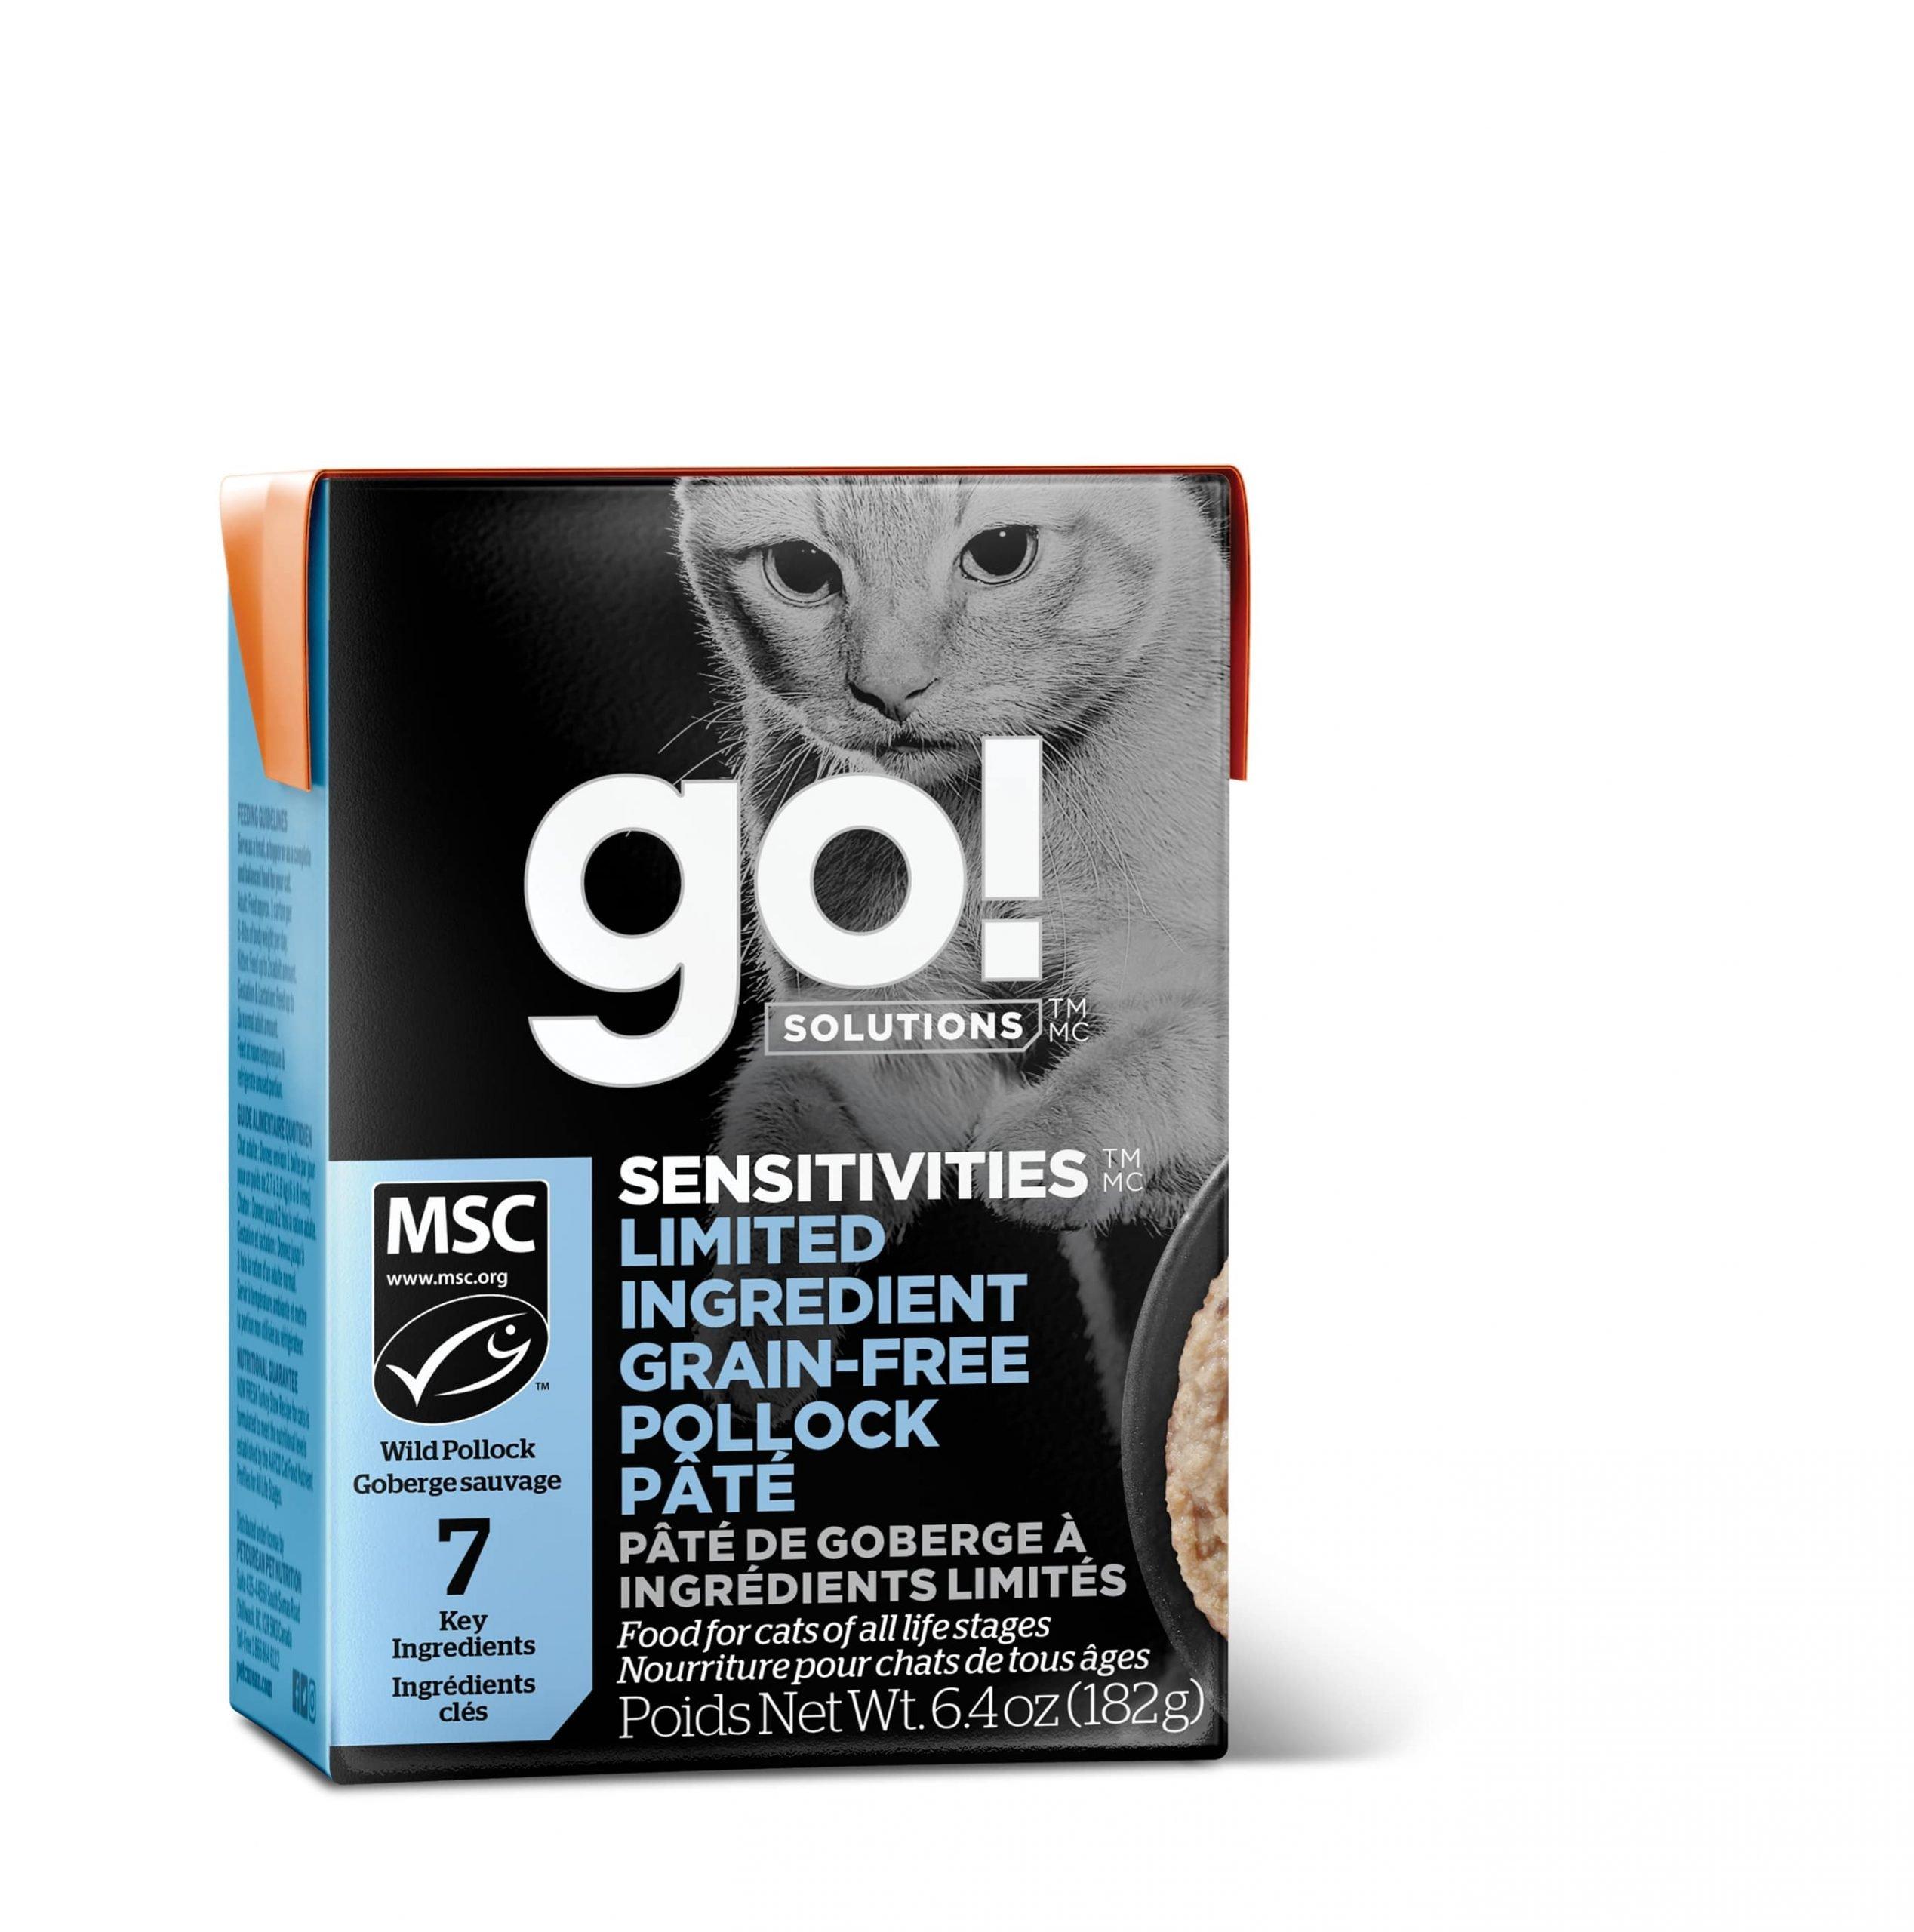 Go! Sensitivities - Pollock Pate Cat Food